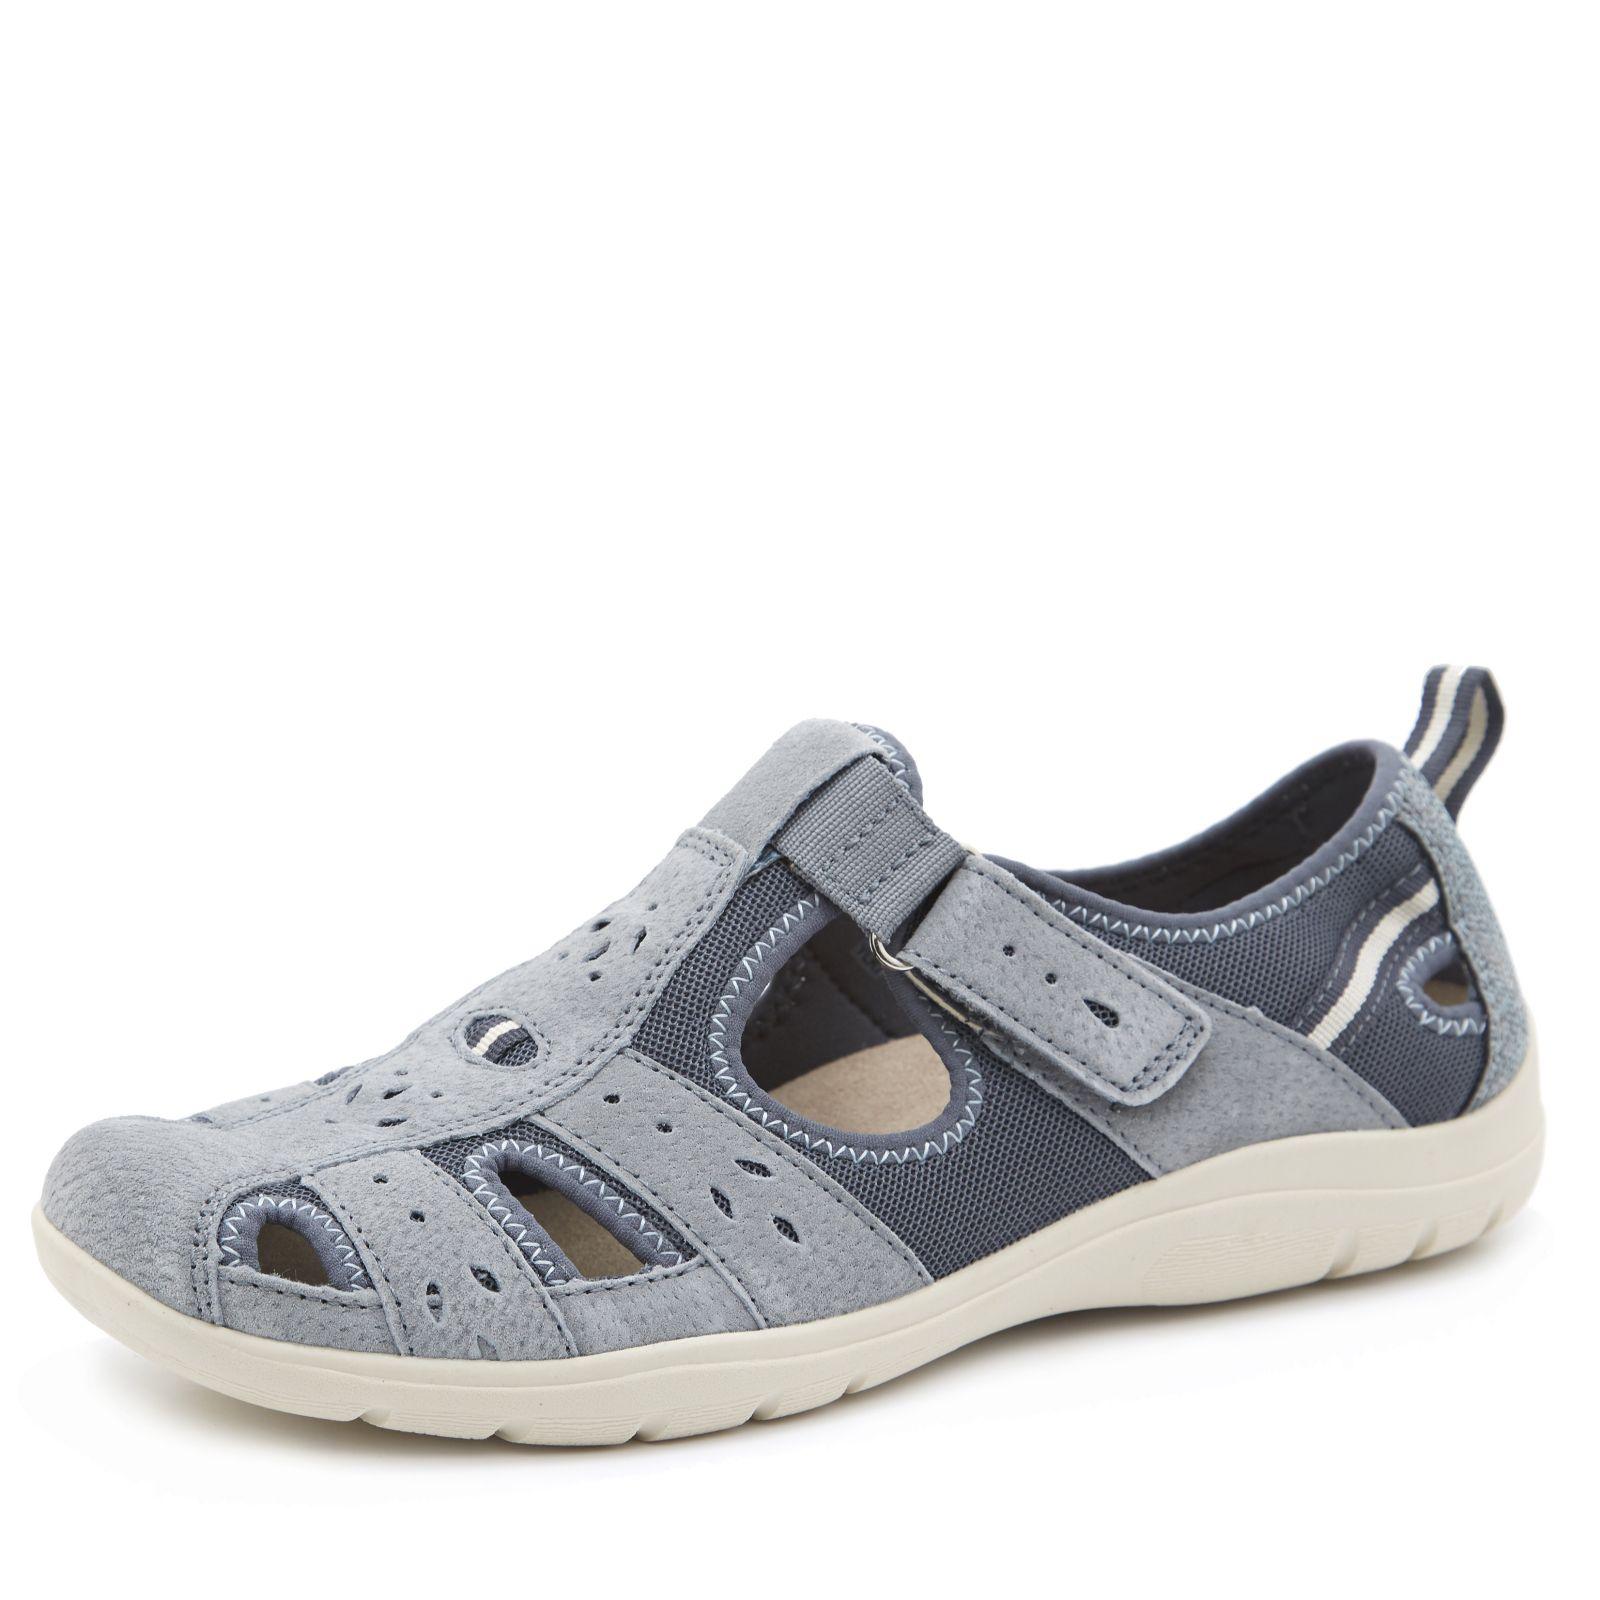 fd01e70823c7 Earth Spirit Cleveland Sporty Casual Shoe - QVC UK